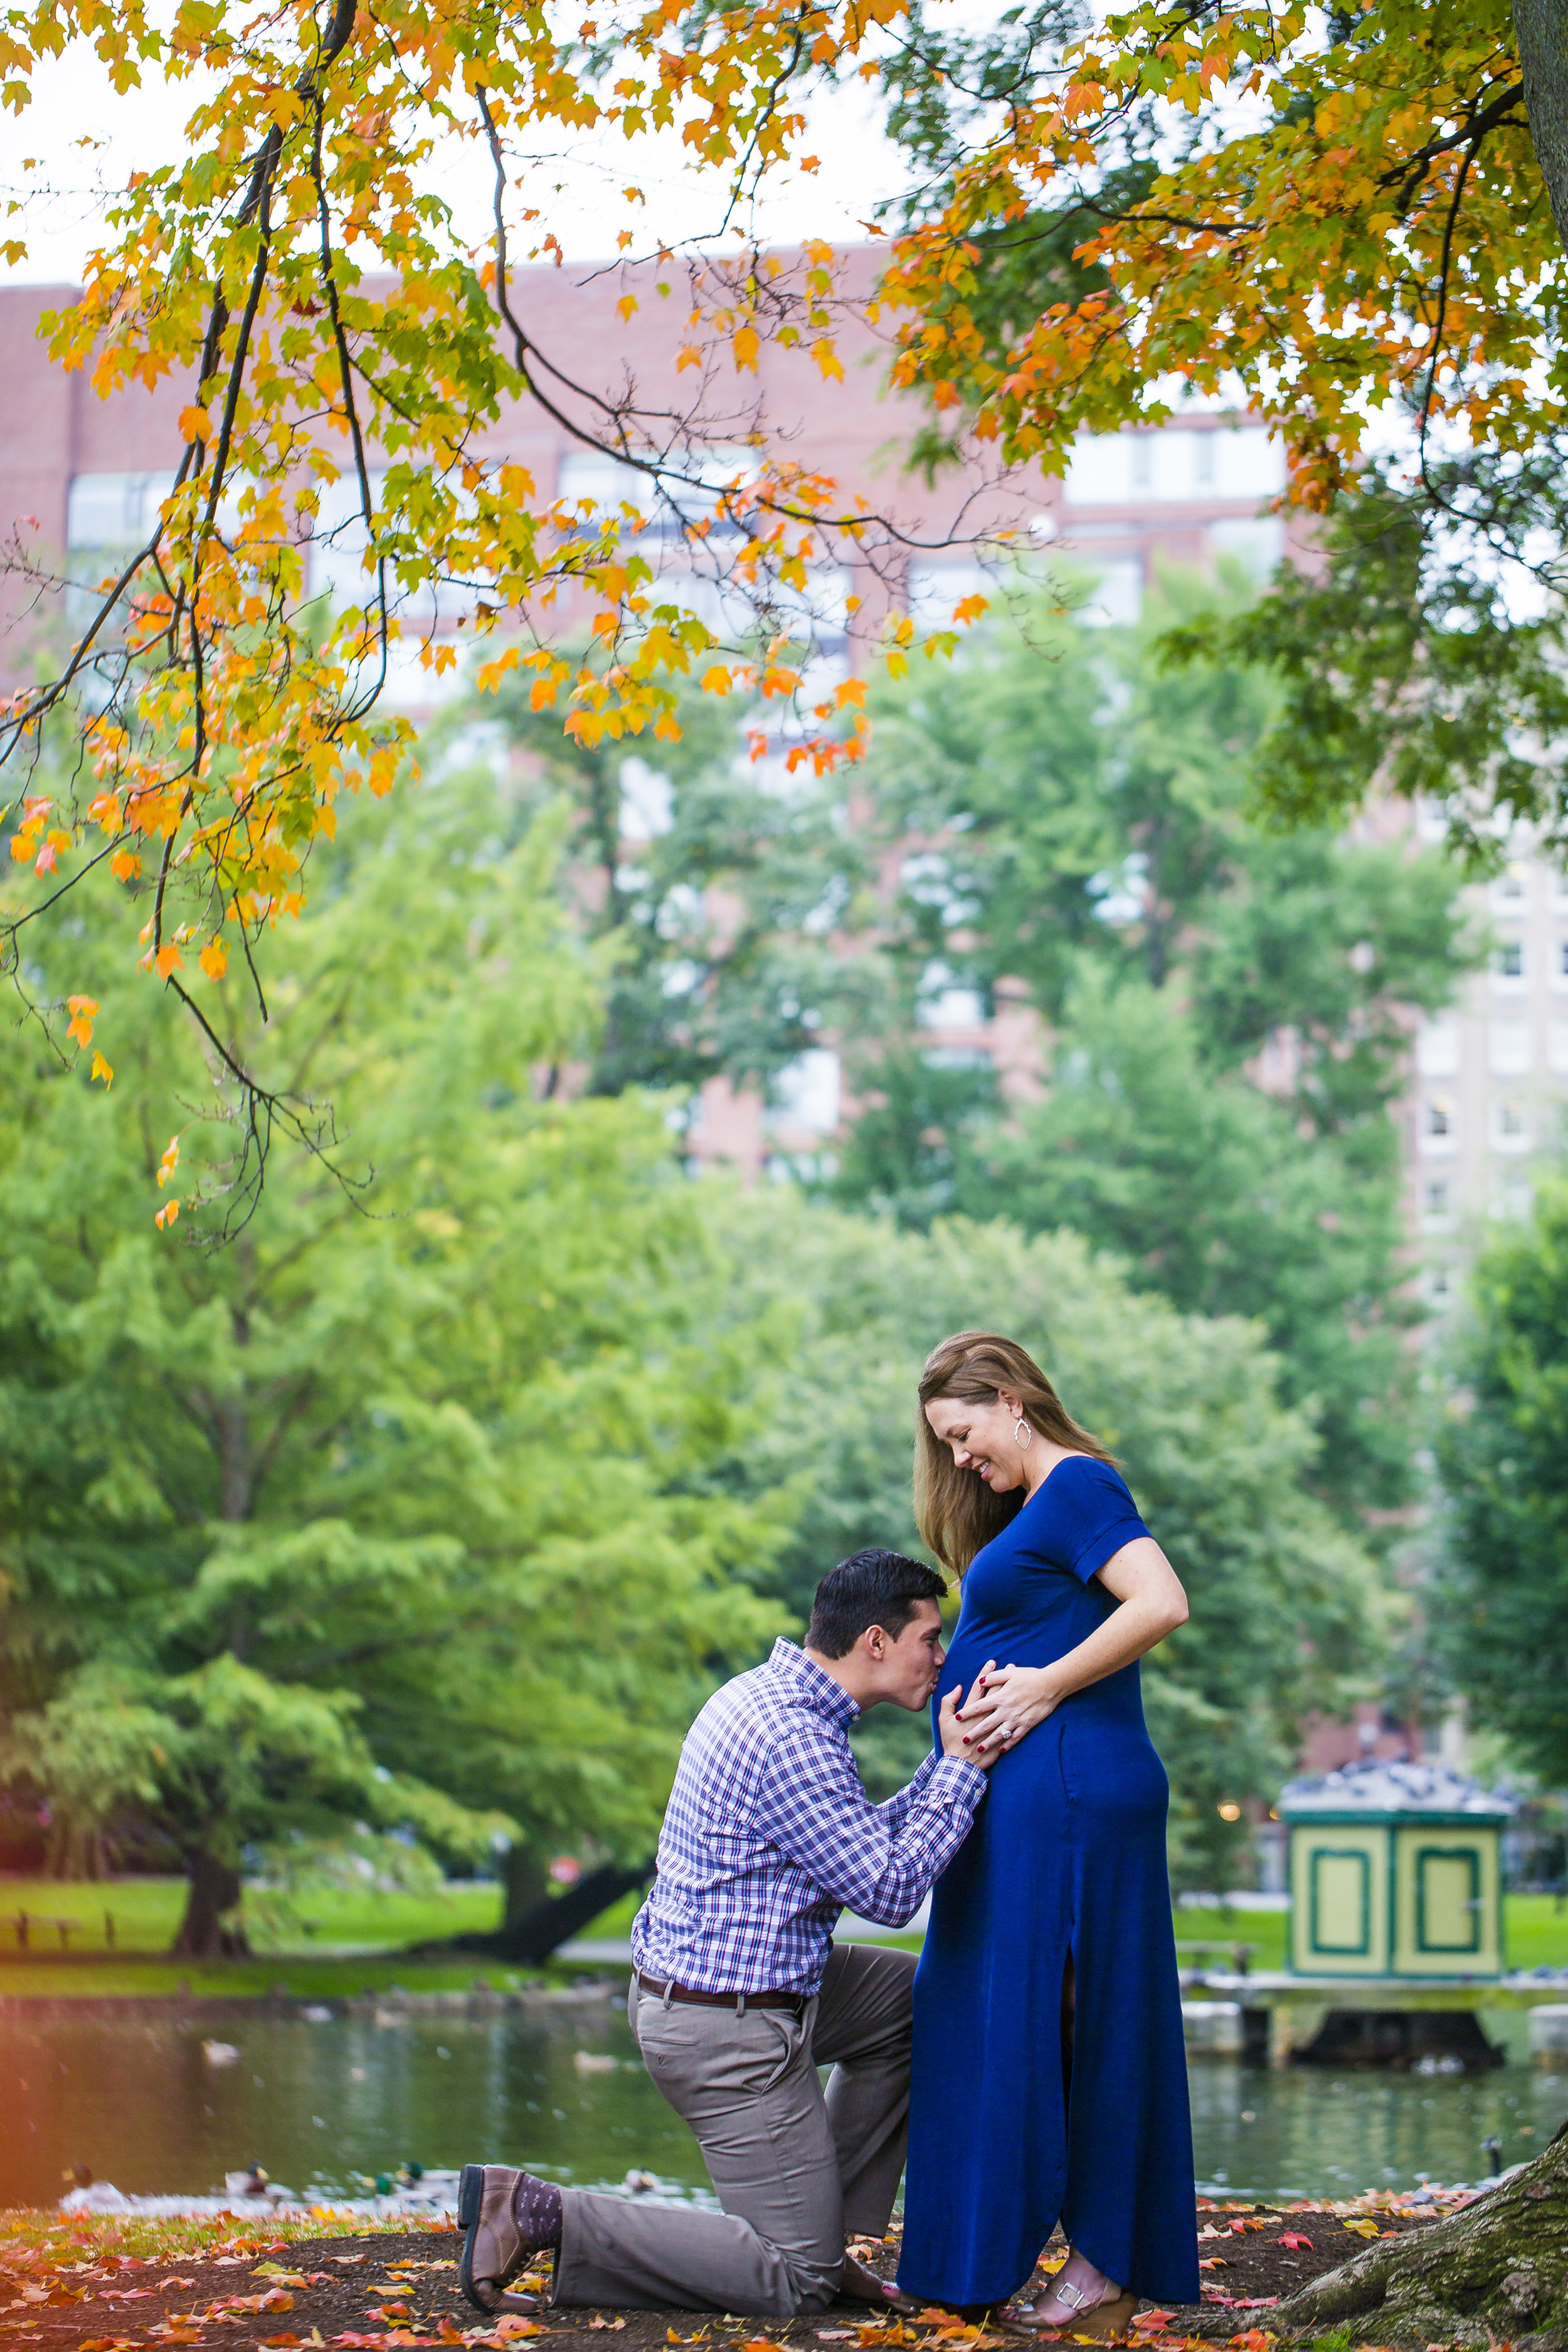 8C2A6338 Giovanni The Photographer Best Boston Maternity New Born Photography Public Garden - Common.jpg